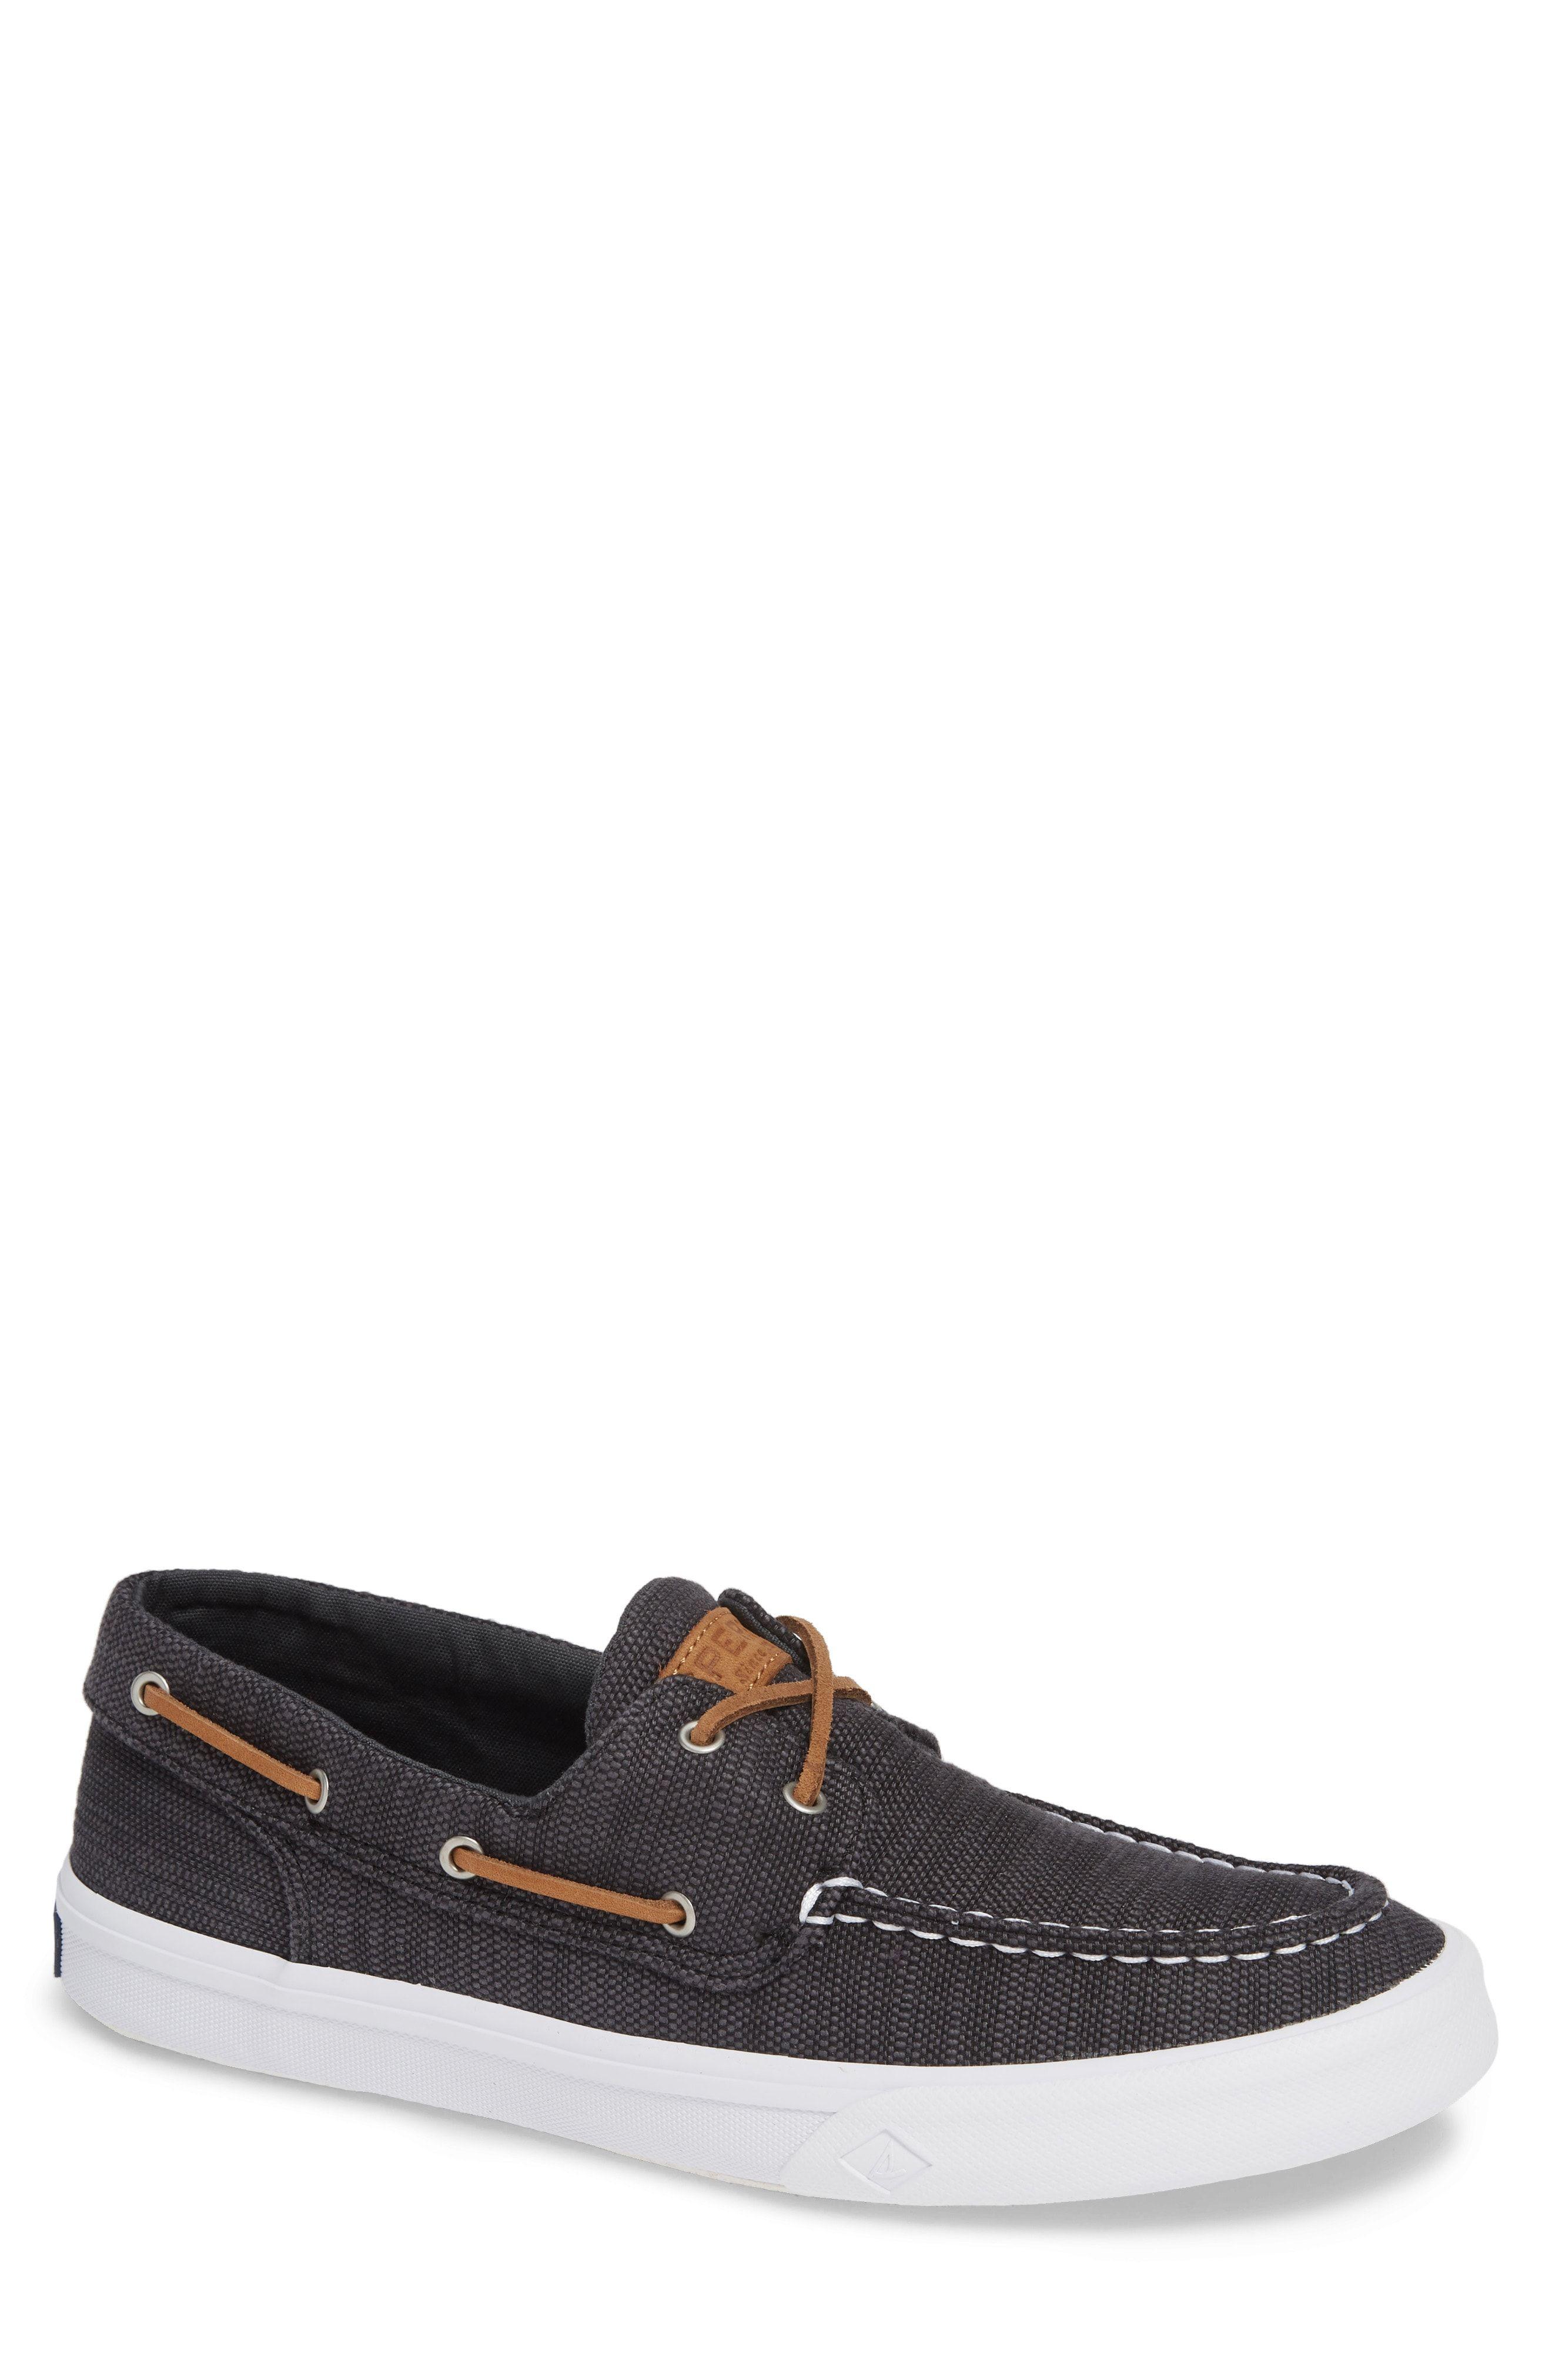 bfc3001d982e SPERRY BAHAMA II BAJA BOAT SHOE. #sperry #shoes | Sperry in 2019 ...